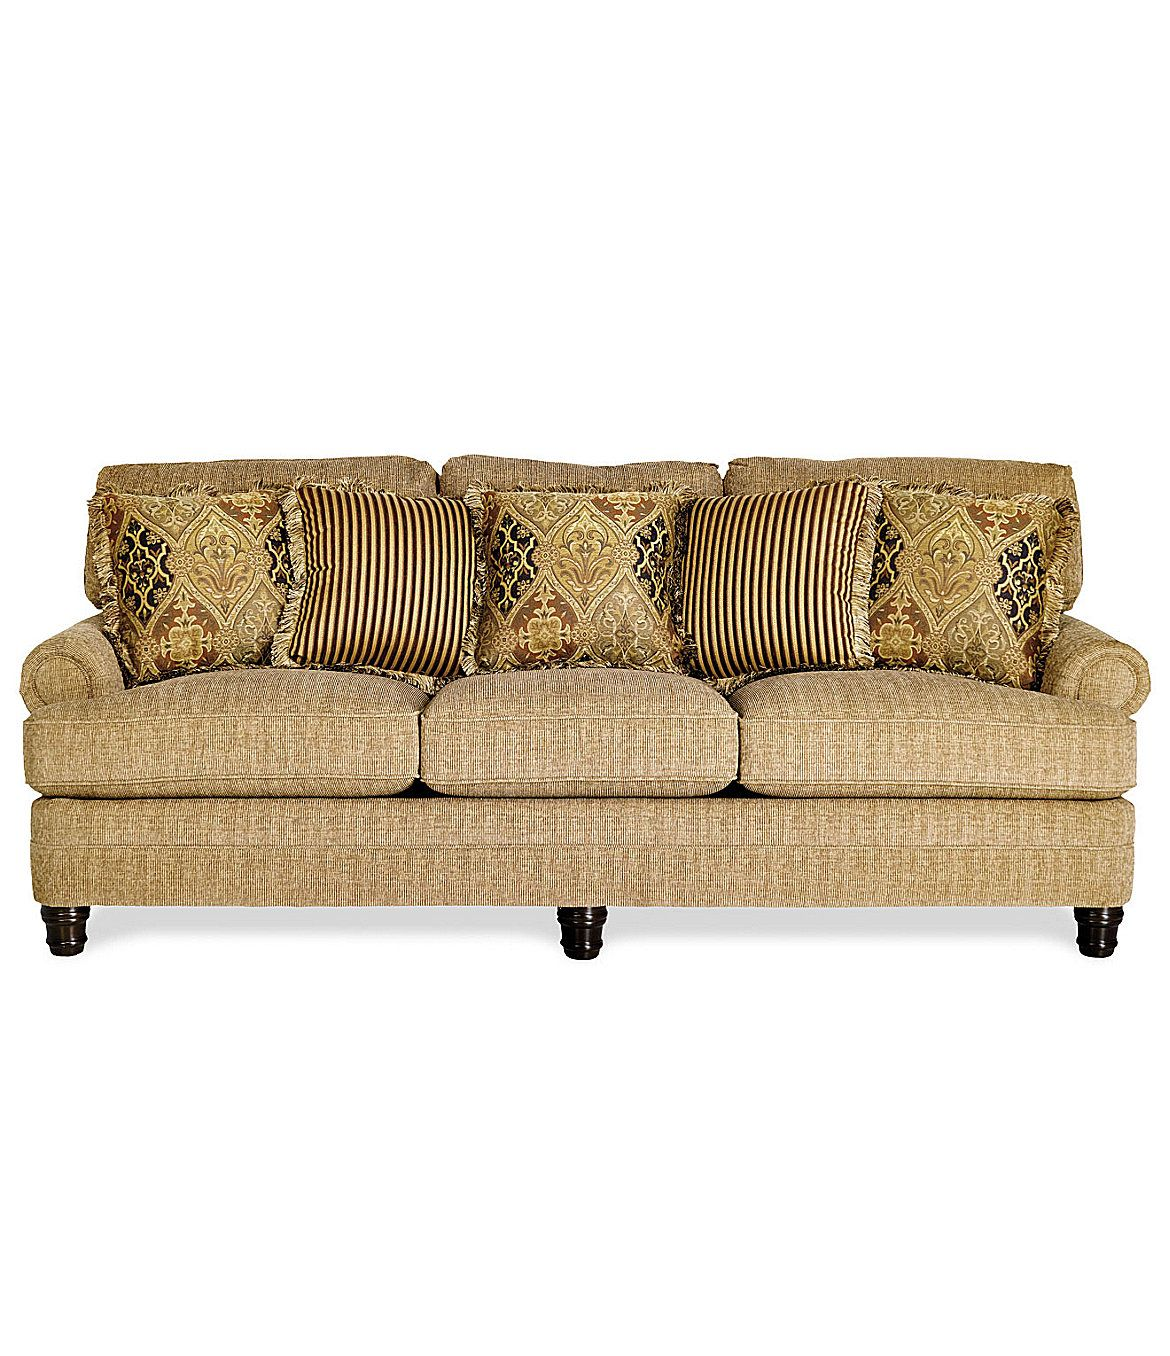 "Bernhardt ""Hamlin"" Sofa On Sale At Dillards For $1199"